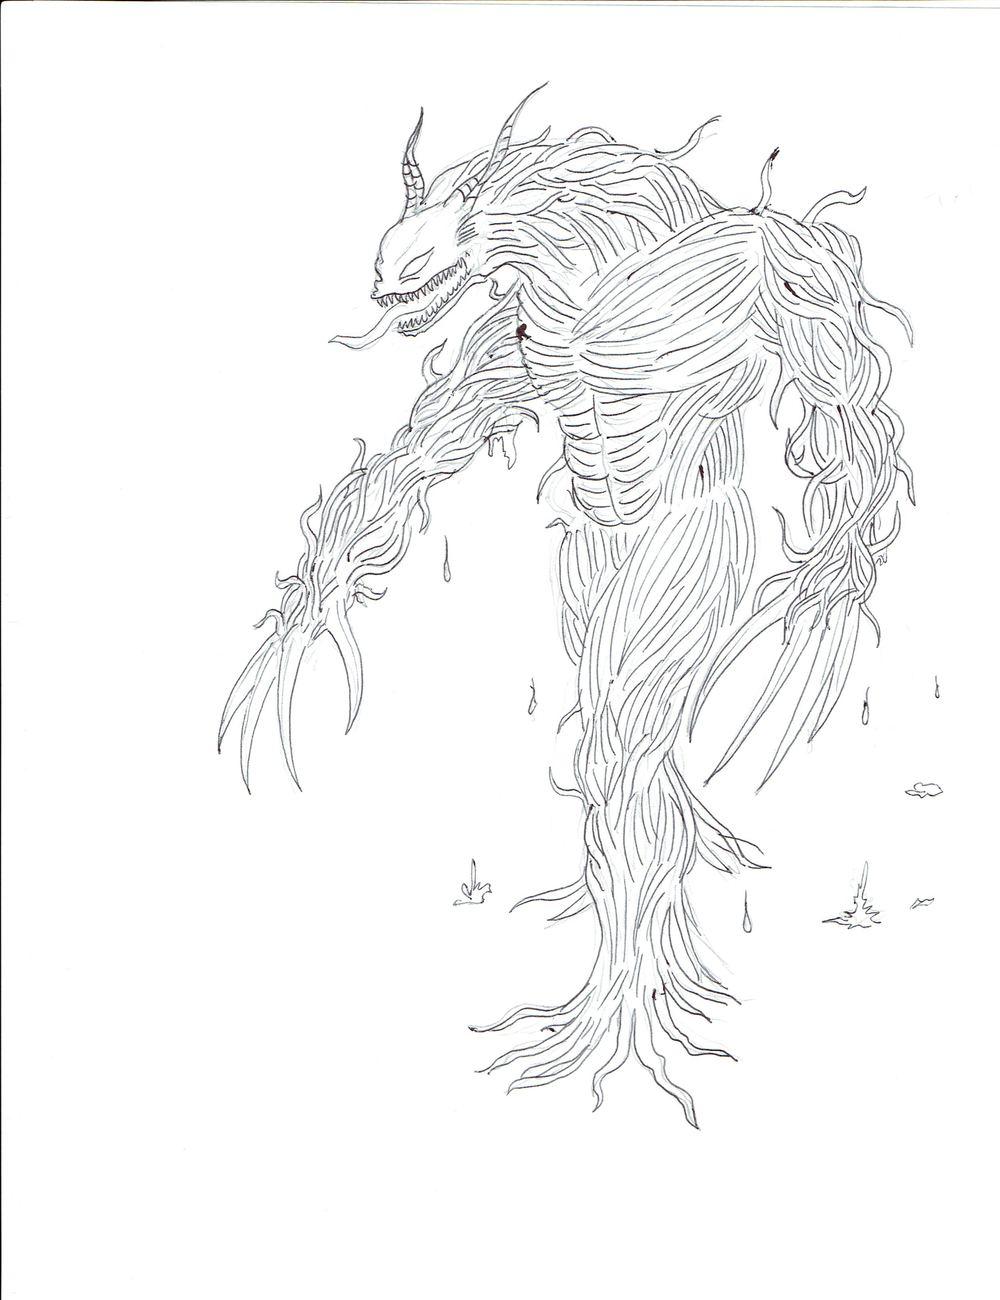 Astaroth the Annihilator